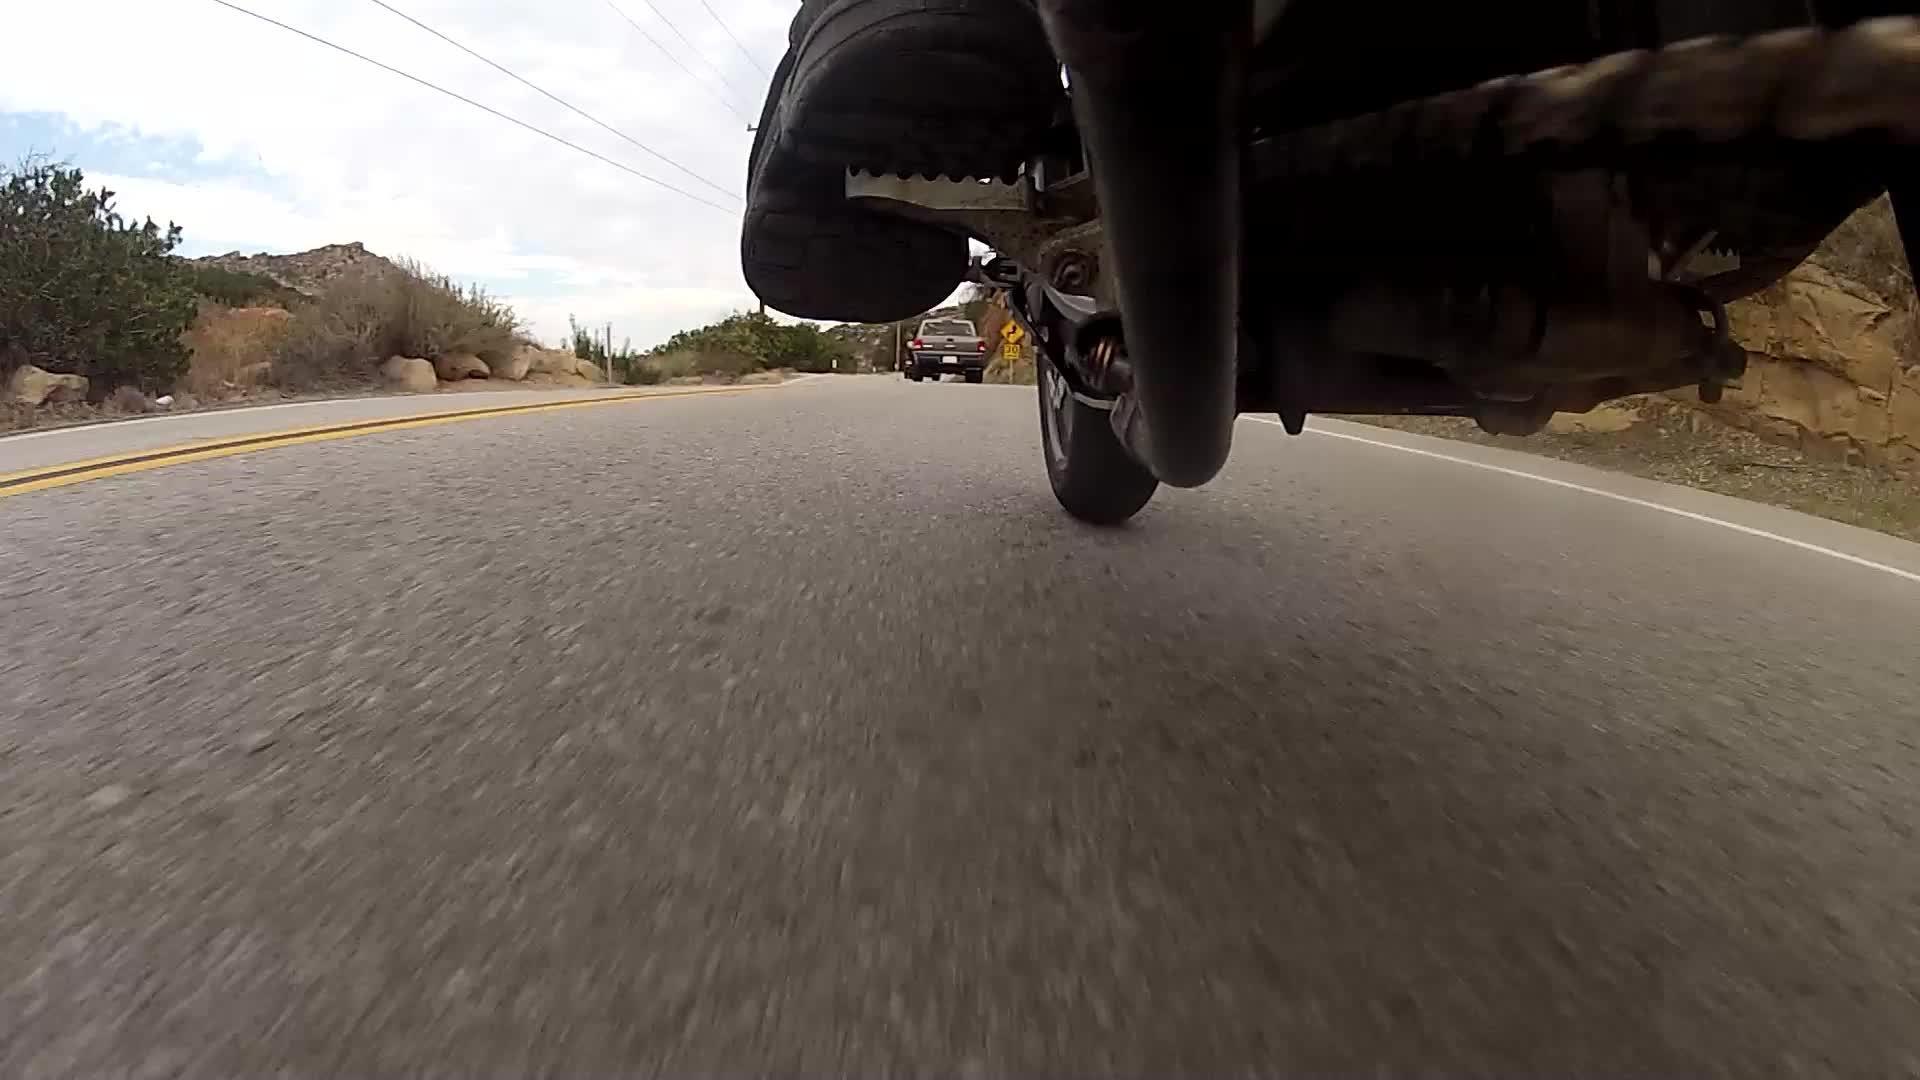 calamariraceteam, motorcycles, supermoto, swingarmwheelie GIFs